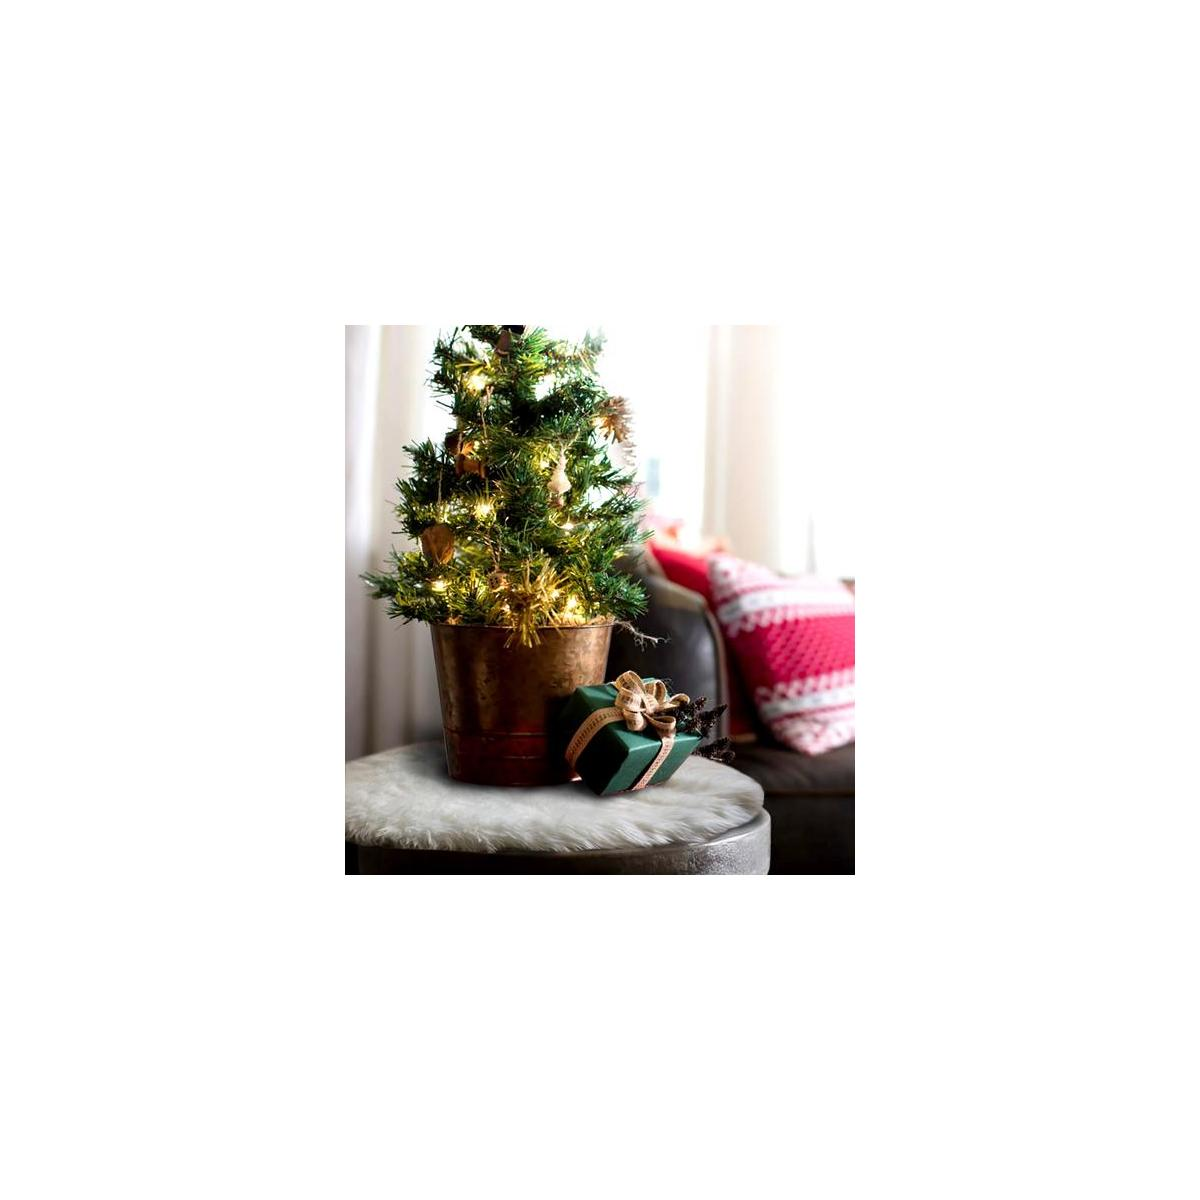 OLYPHAN Mini Tree Skirt Small Christmas Tree Skirt White ...